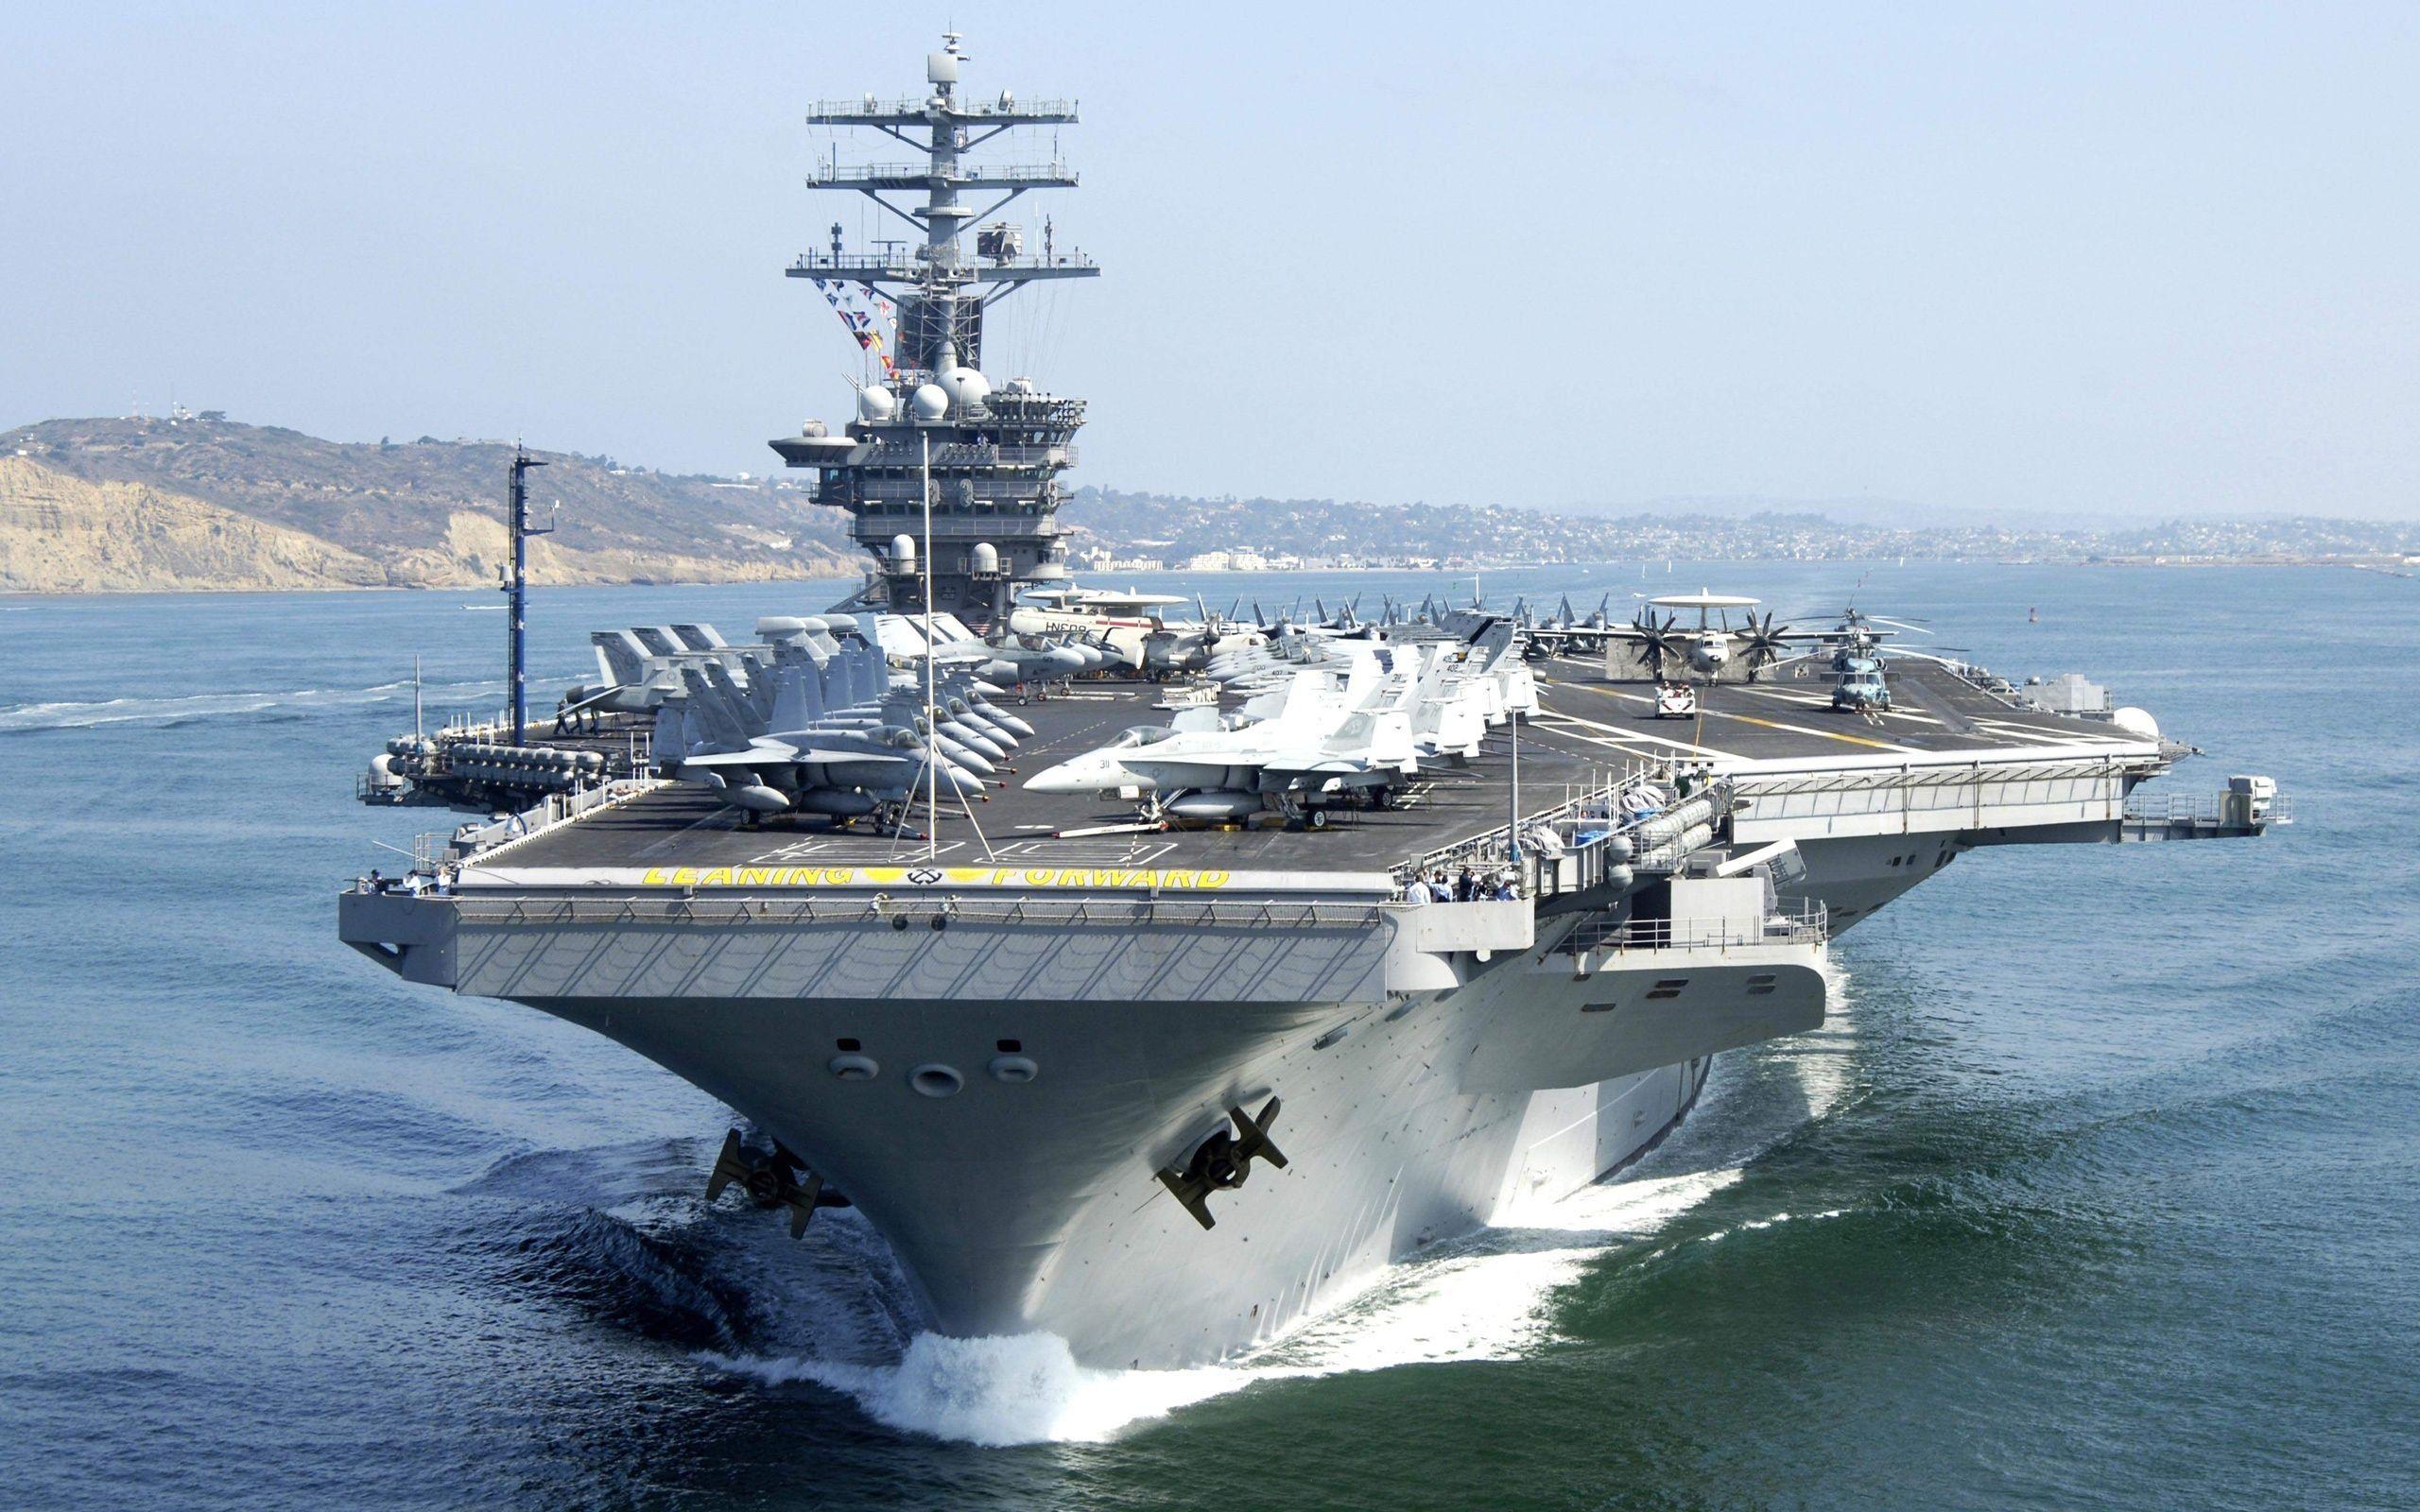 Navy Ships Boat Ship Military Warship Battleship Wallpaper Aircraft Carrier Uss Nimitz Navy Ships